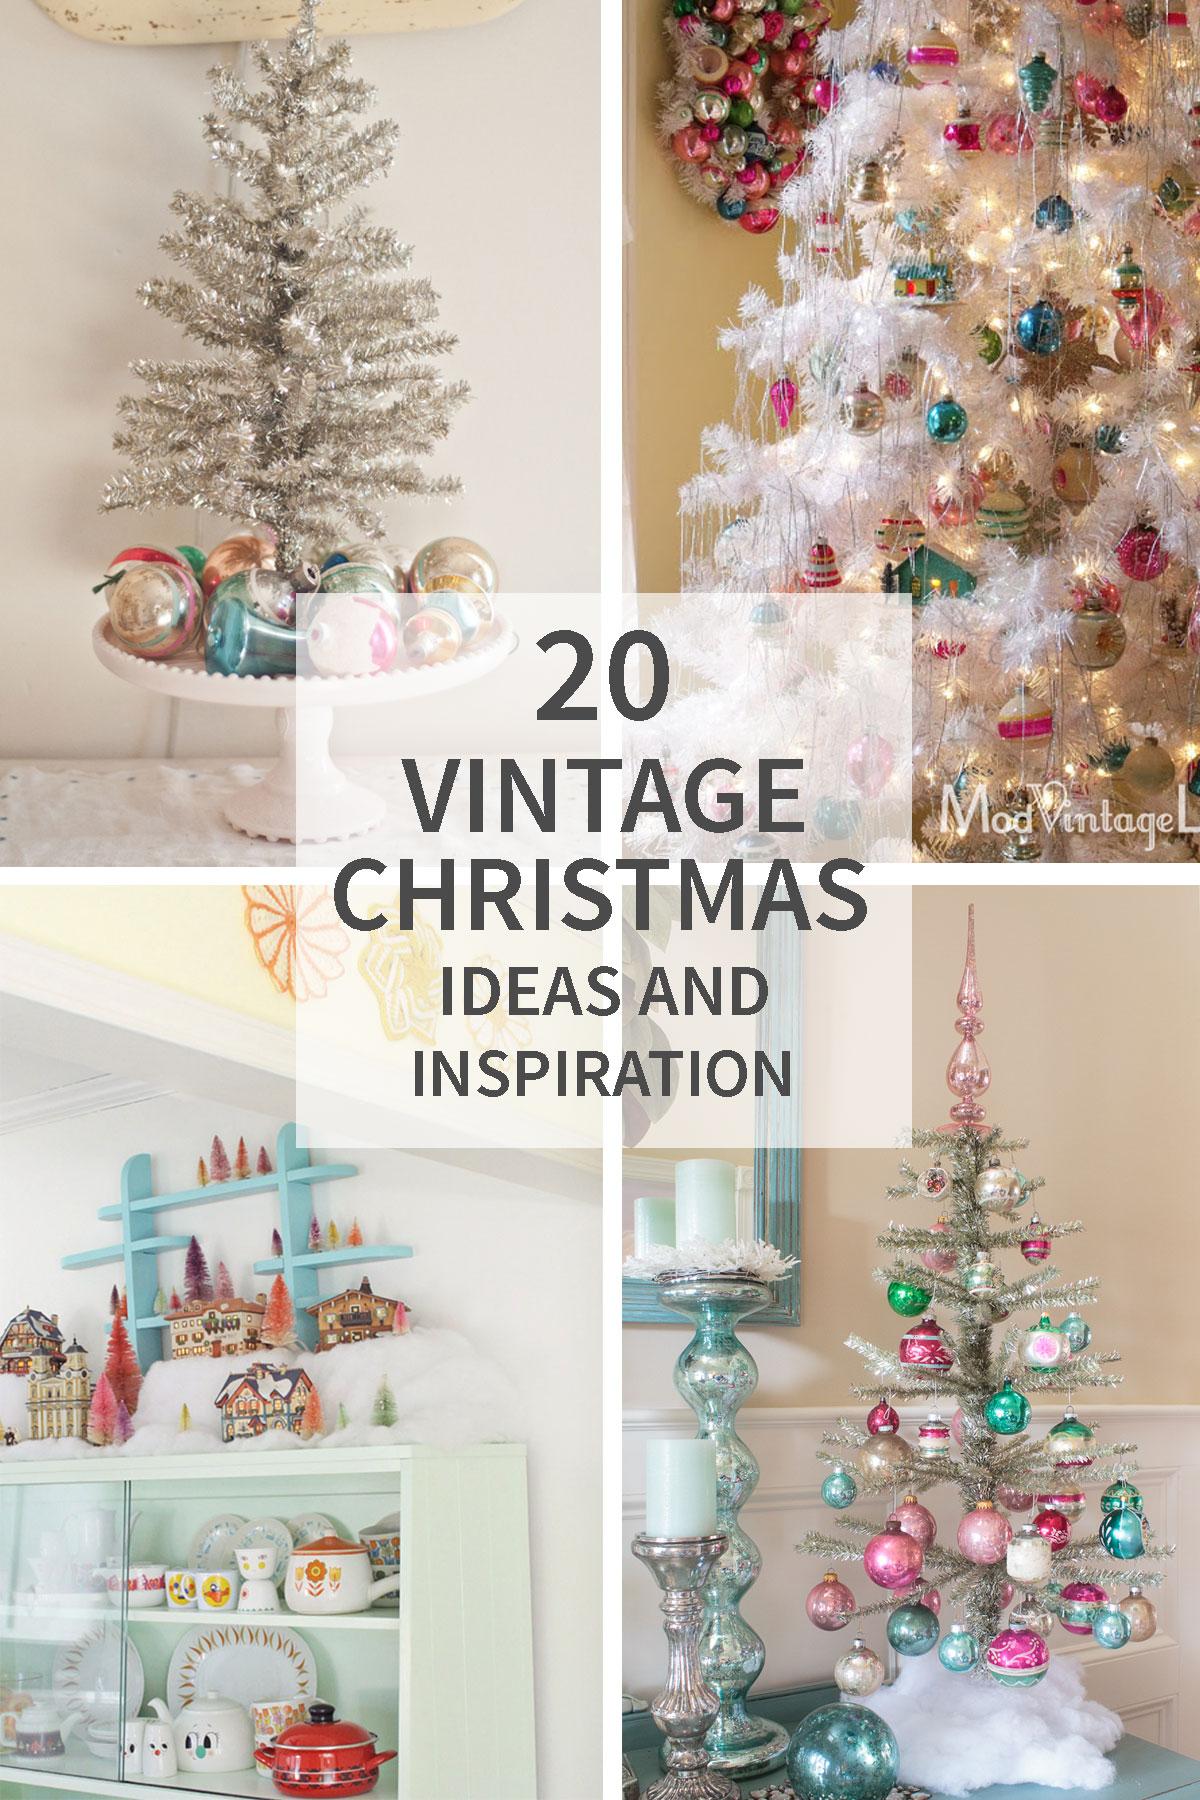 Pink Christmas Inspiration and Ideas - Tidbits